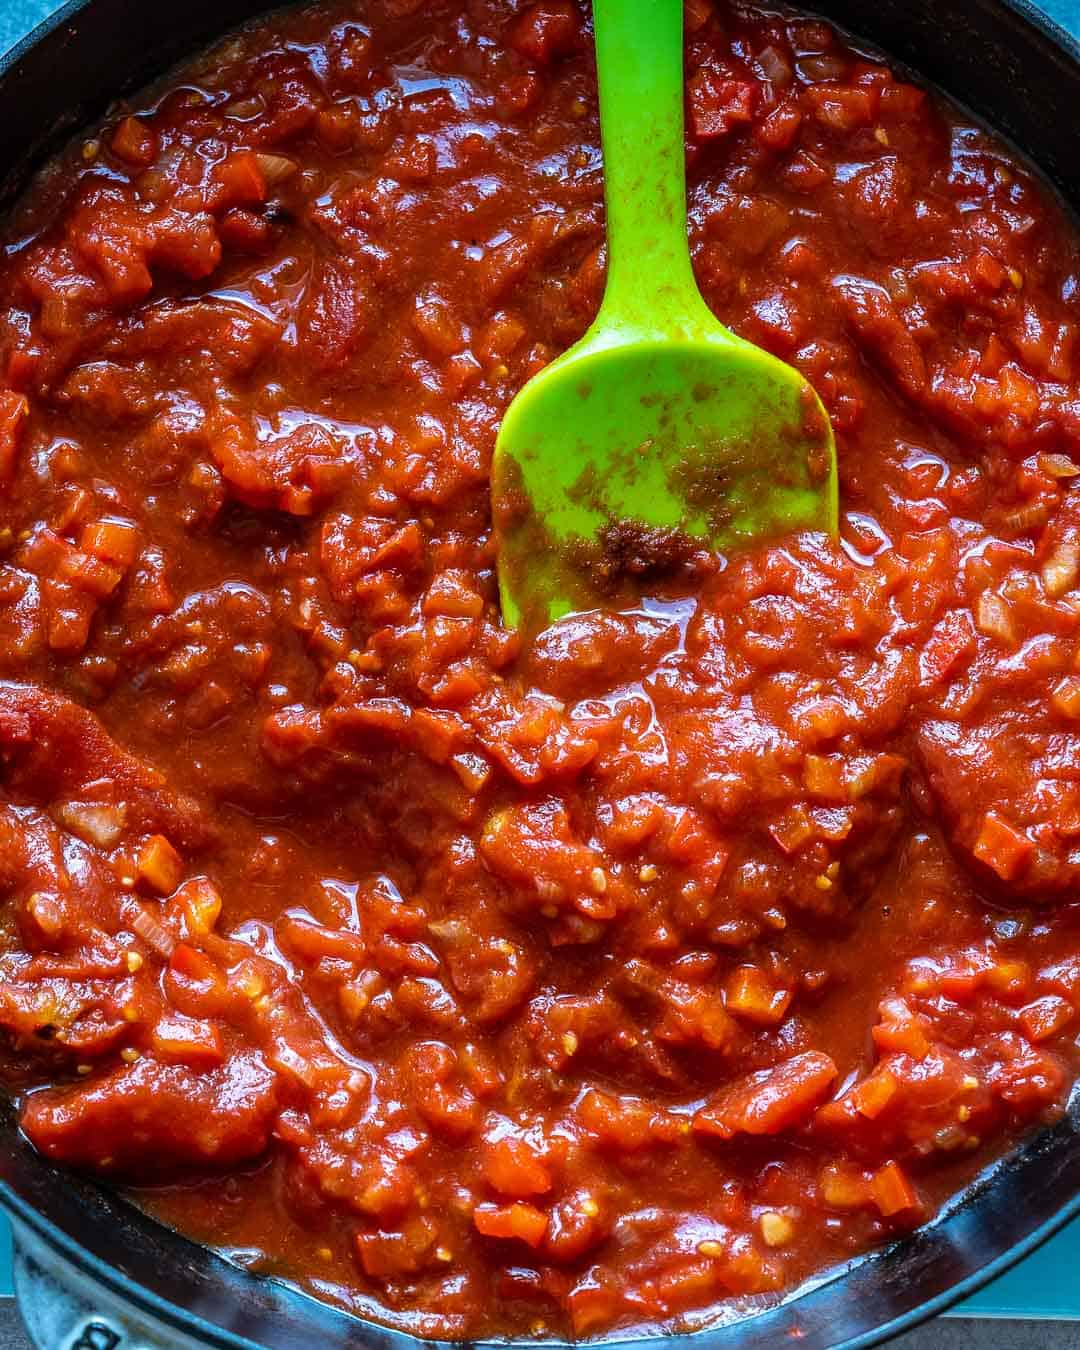 Tomato sauce simmering in pan